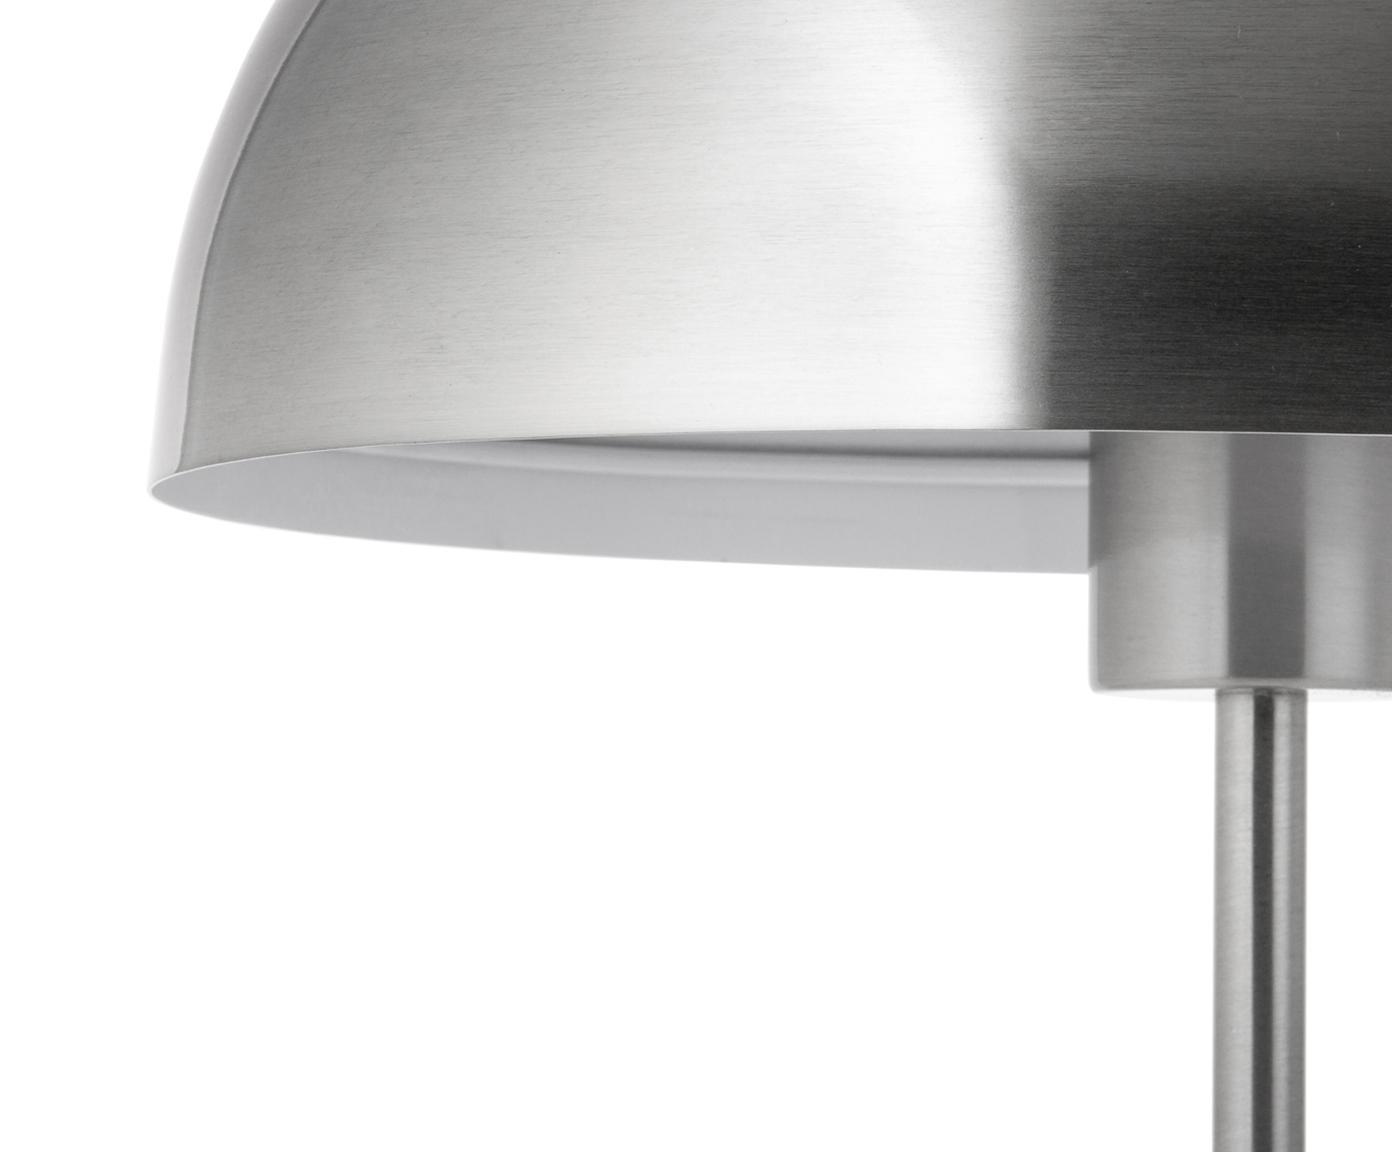 Lampa stołowa Matilda, Nikiel, Ø 29 x W 45 cm